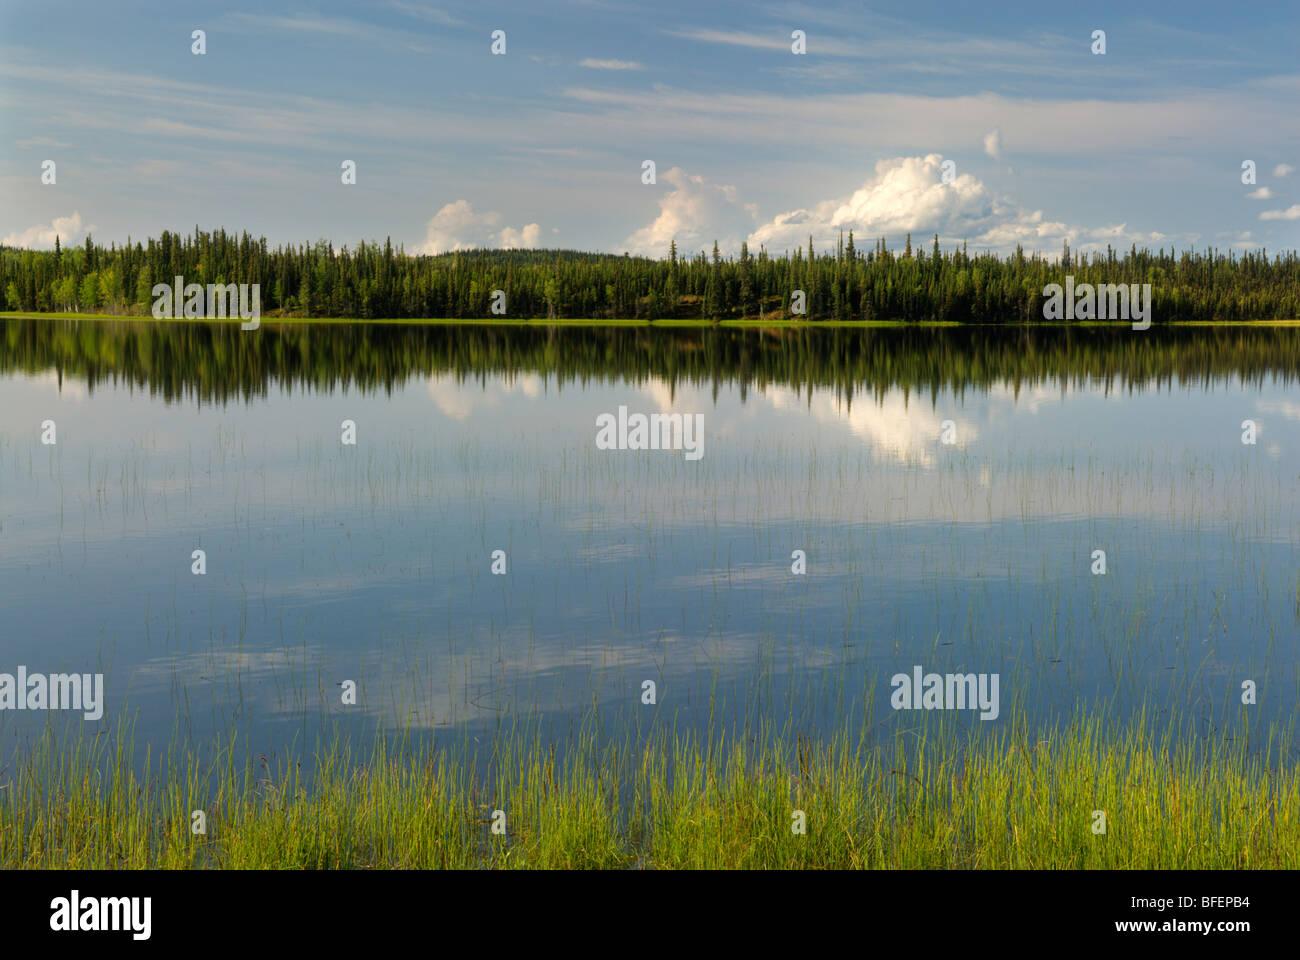 Deadman Lake, Tetlin National Wildlife Refuge, Alaska, United States of America - Stock Image